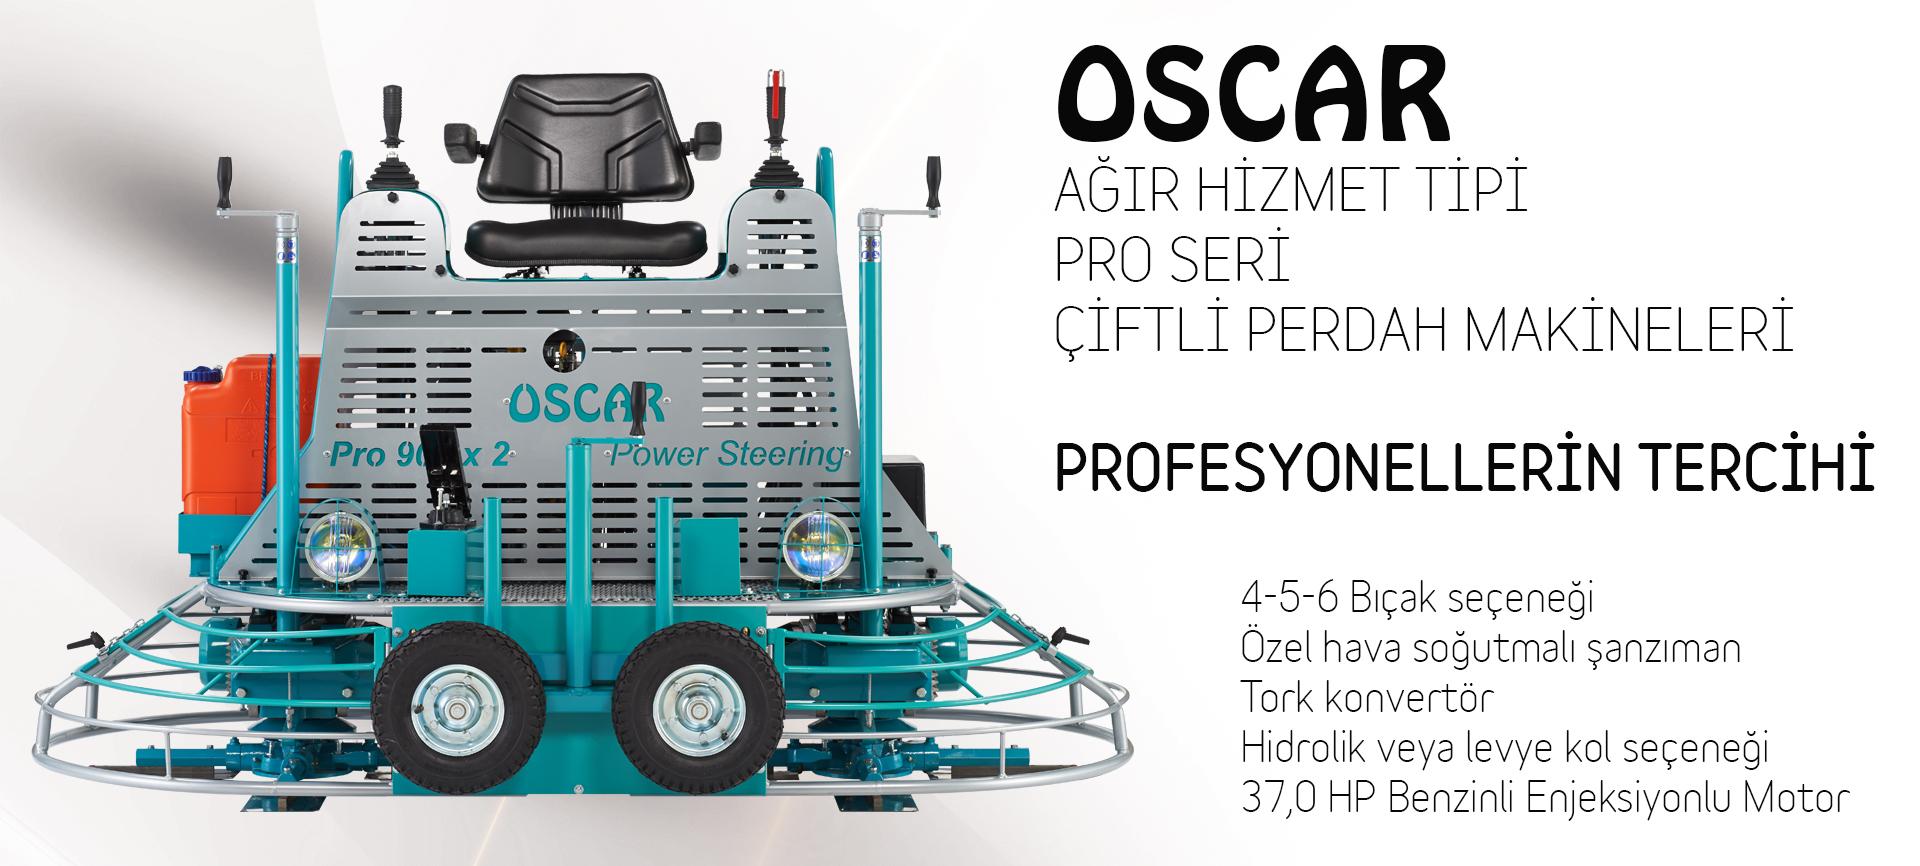 oscarwebshop.com